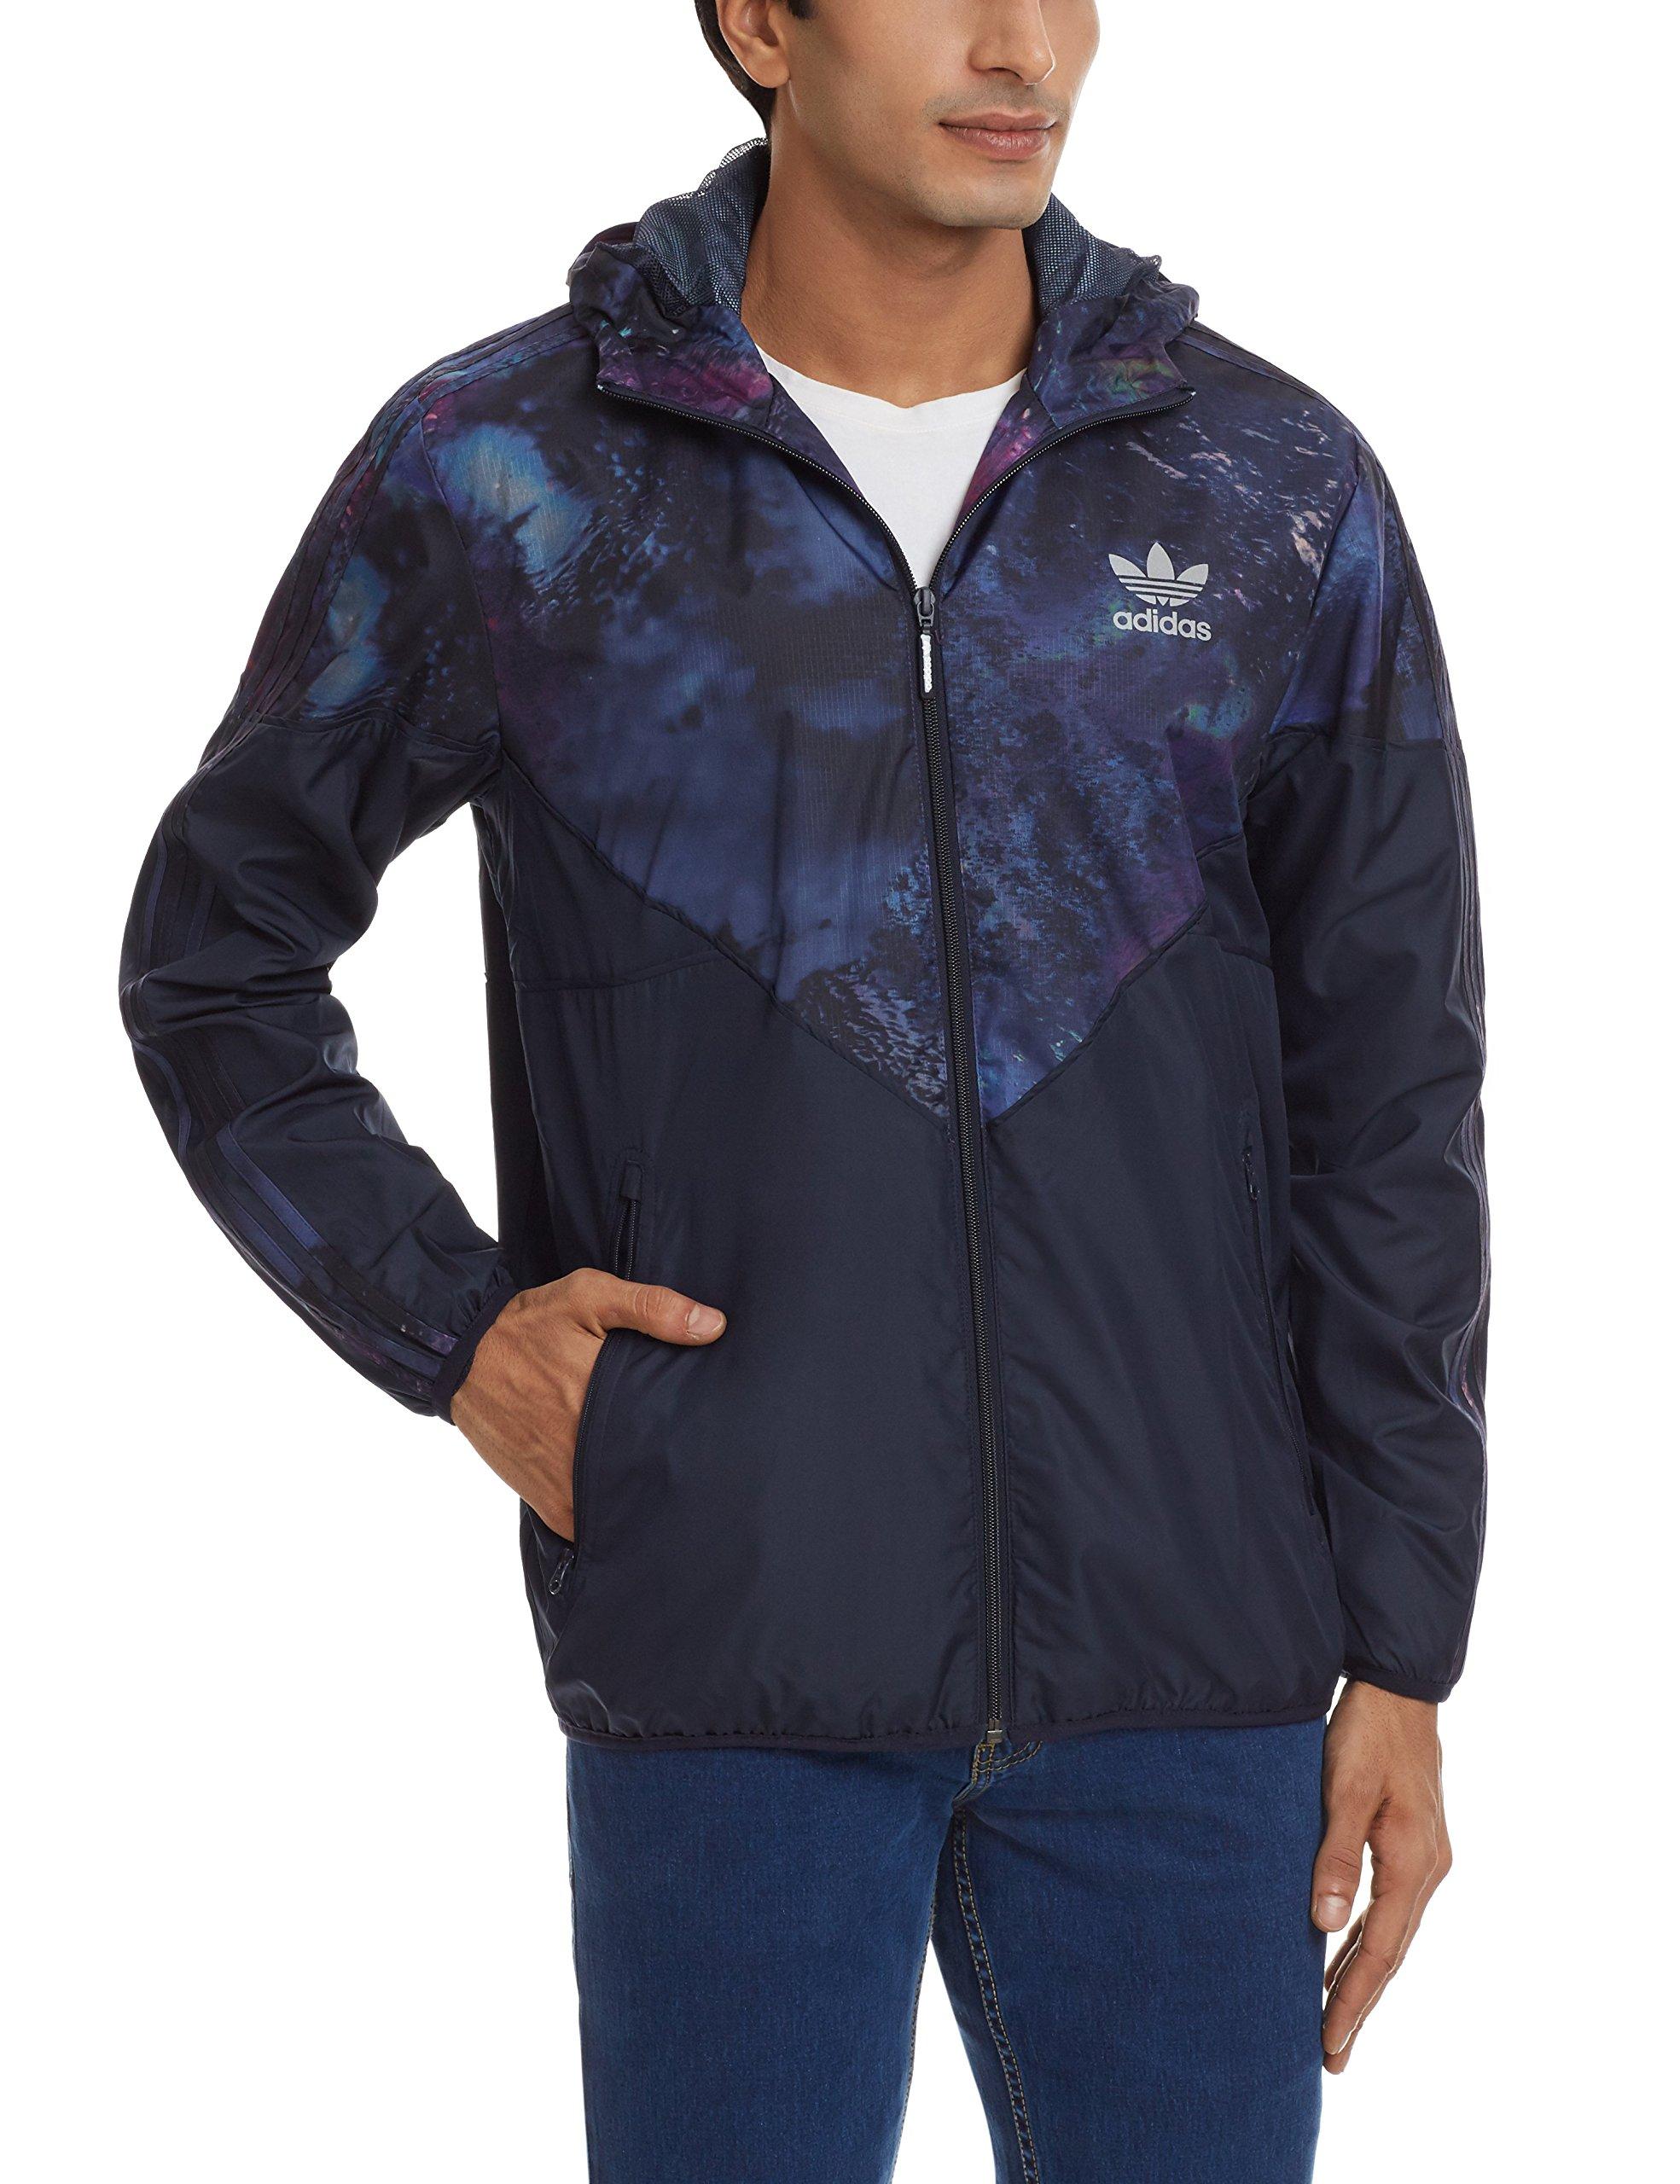 Adidas Colorado Wb Giacca Uomo, Blu, XL